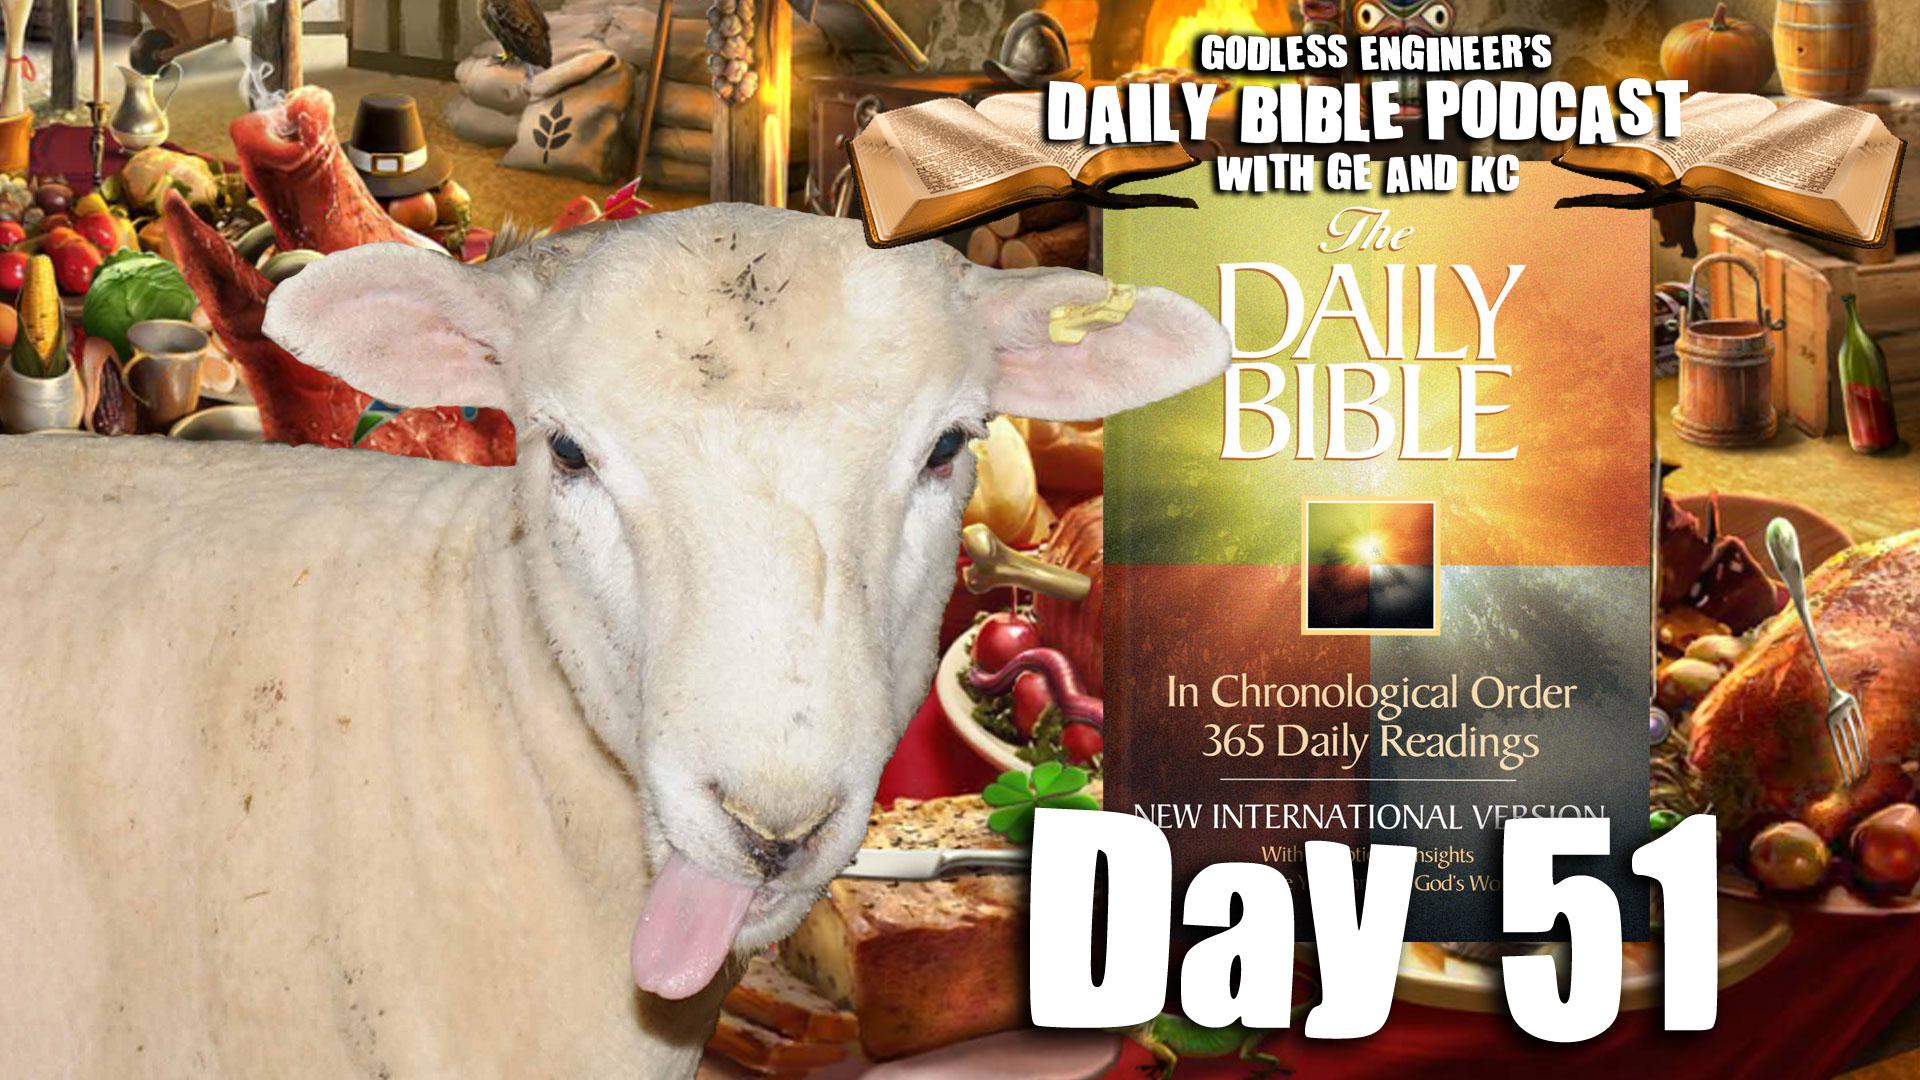 Old Testament Feast Traditions Make No Sense